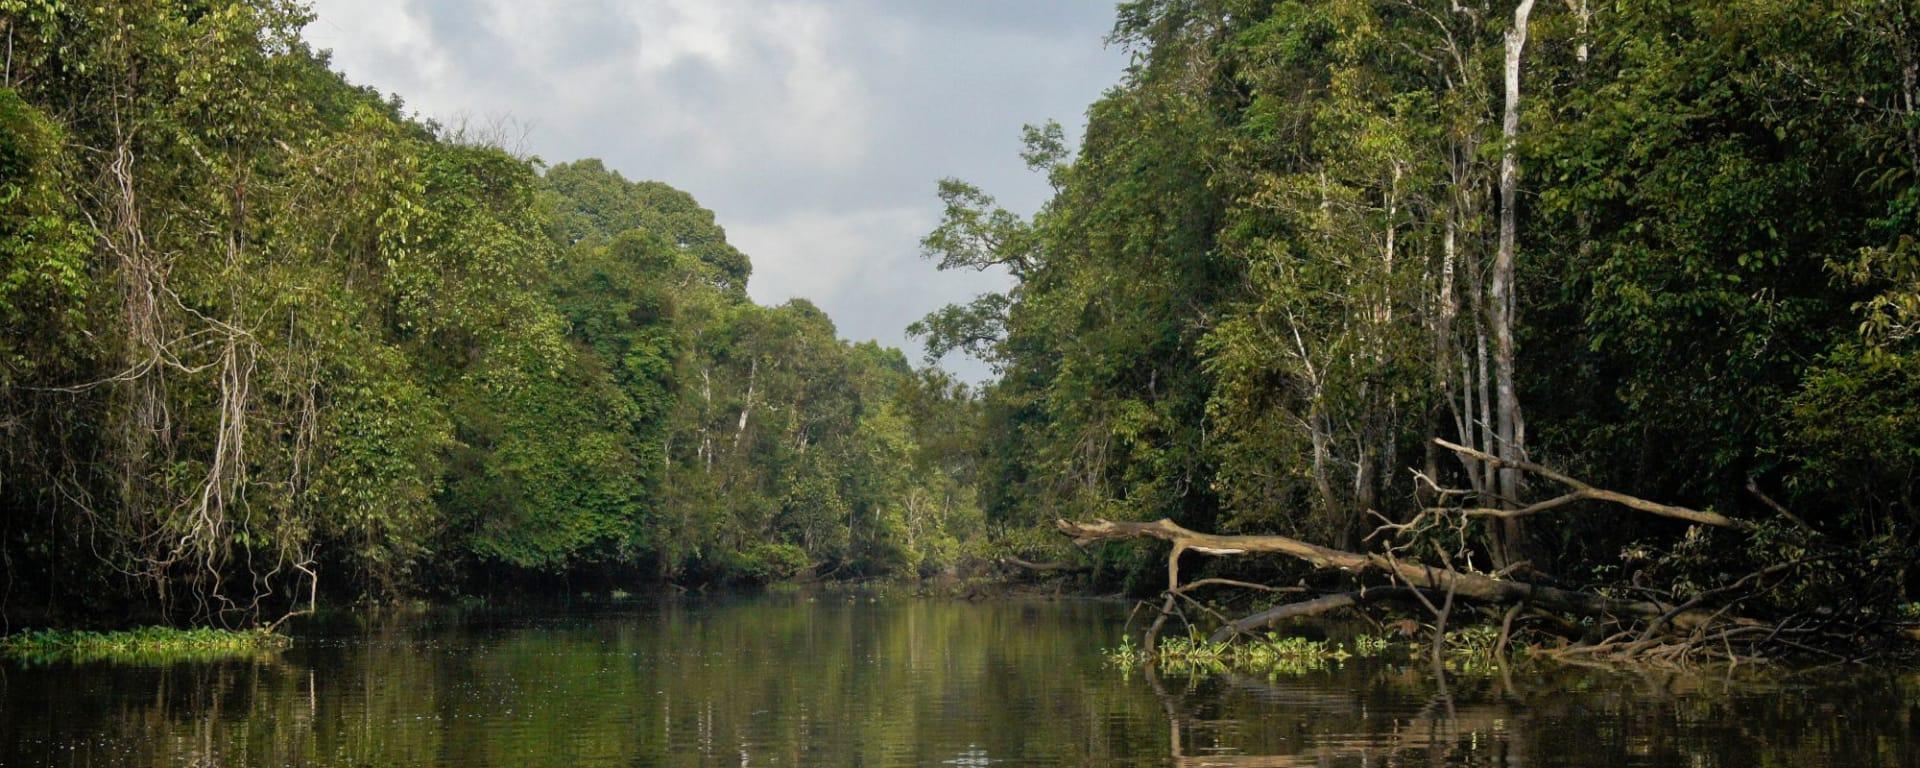 Borneo Wildlife / Tabin Wildlife Reserve ab Kota Kinabalu: Kinabatangan River